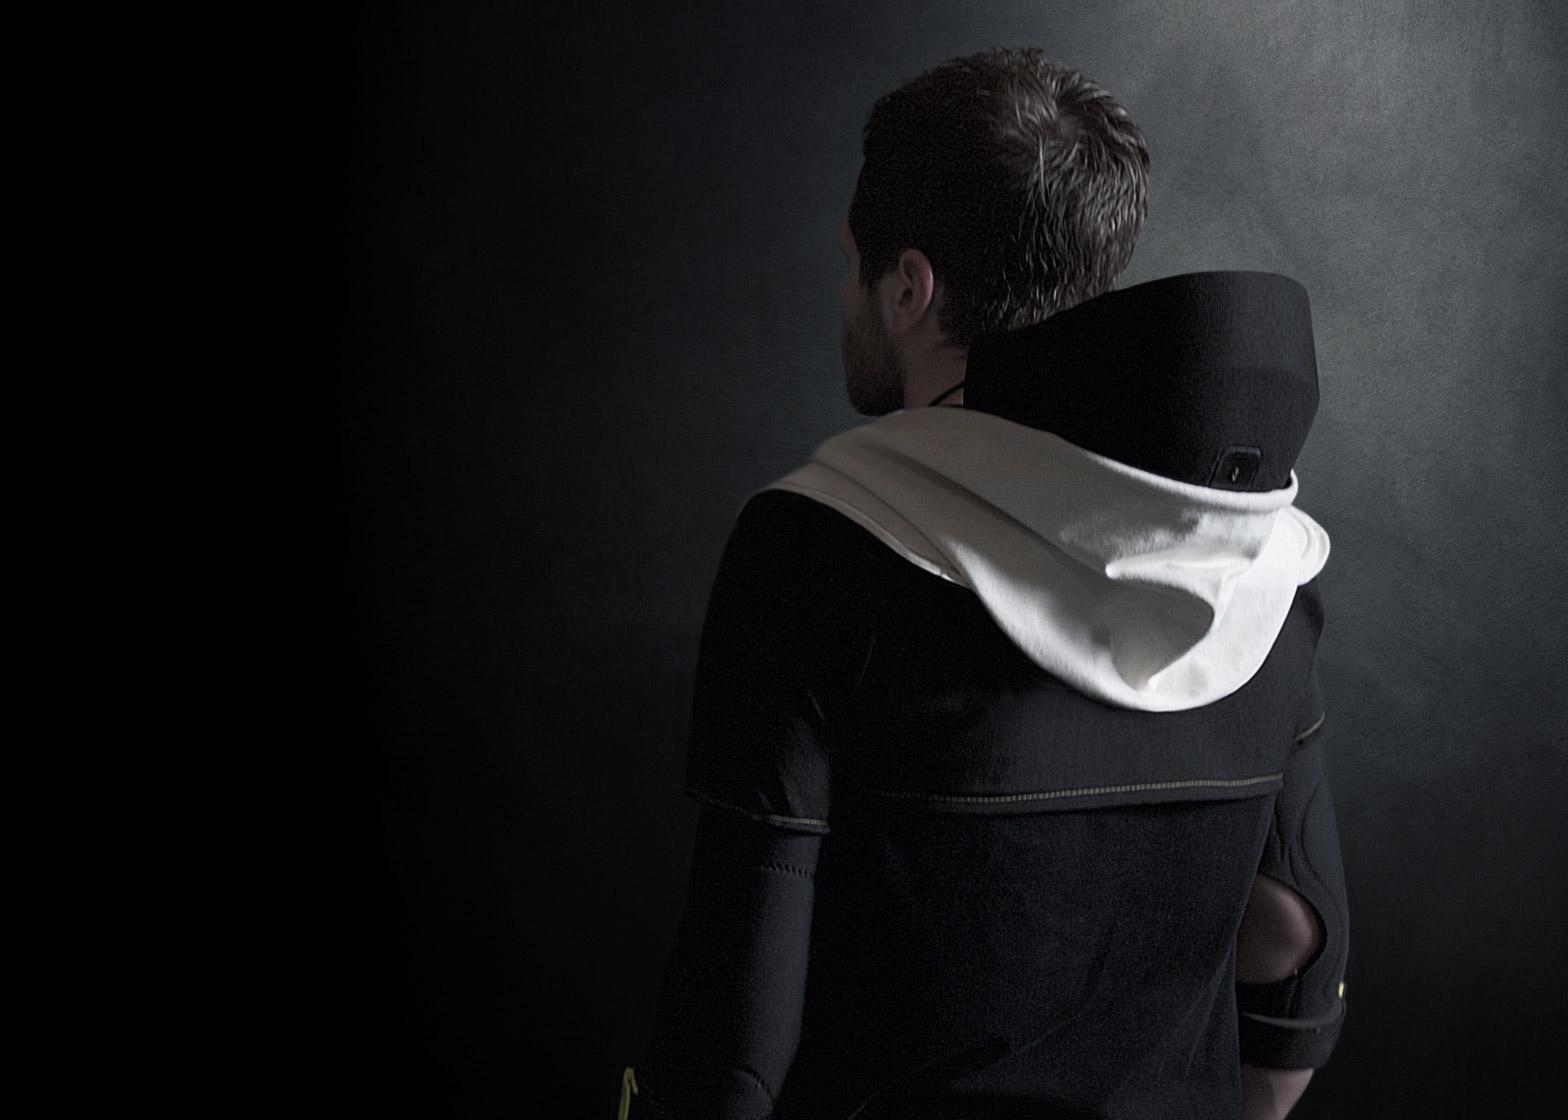 vr-hoodie-artefact-design-technology-virtual-reality-gaming_dezeen_1568_8